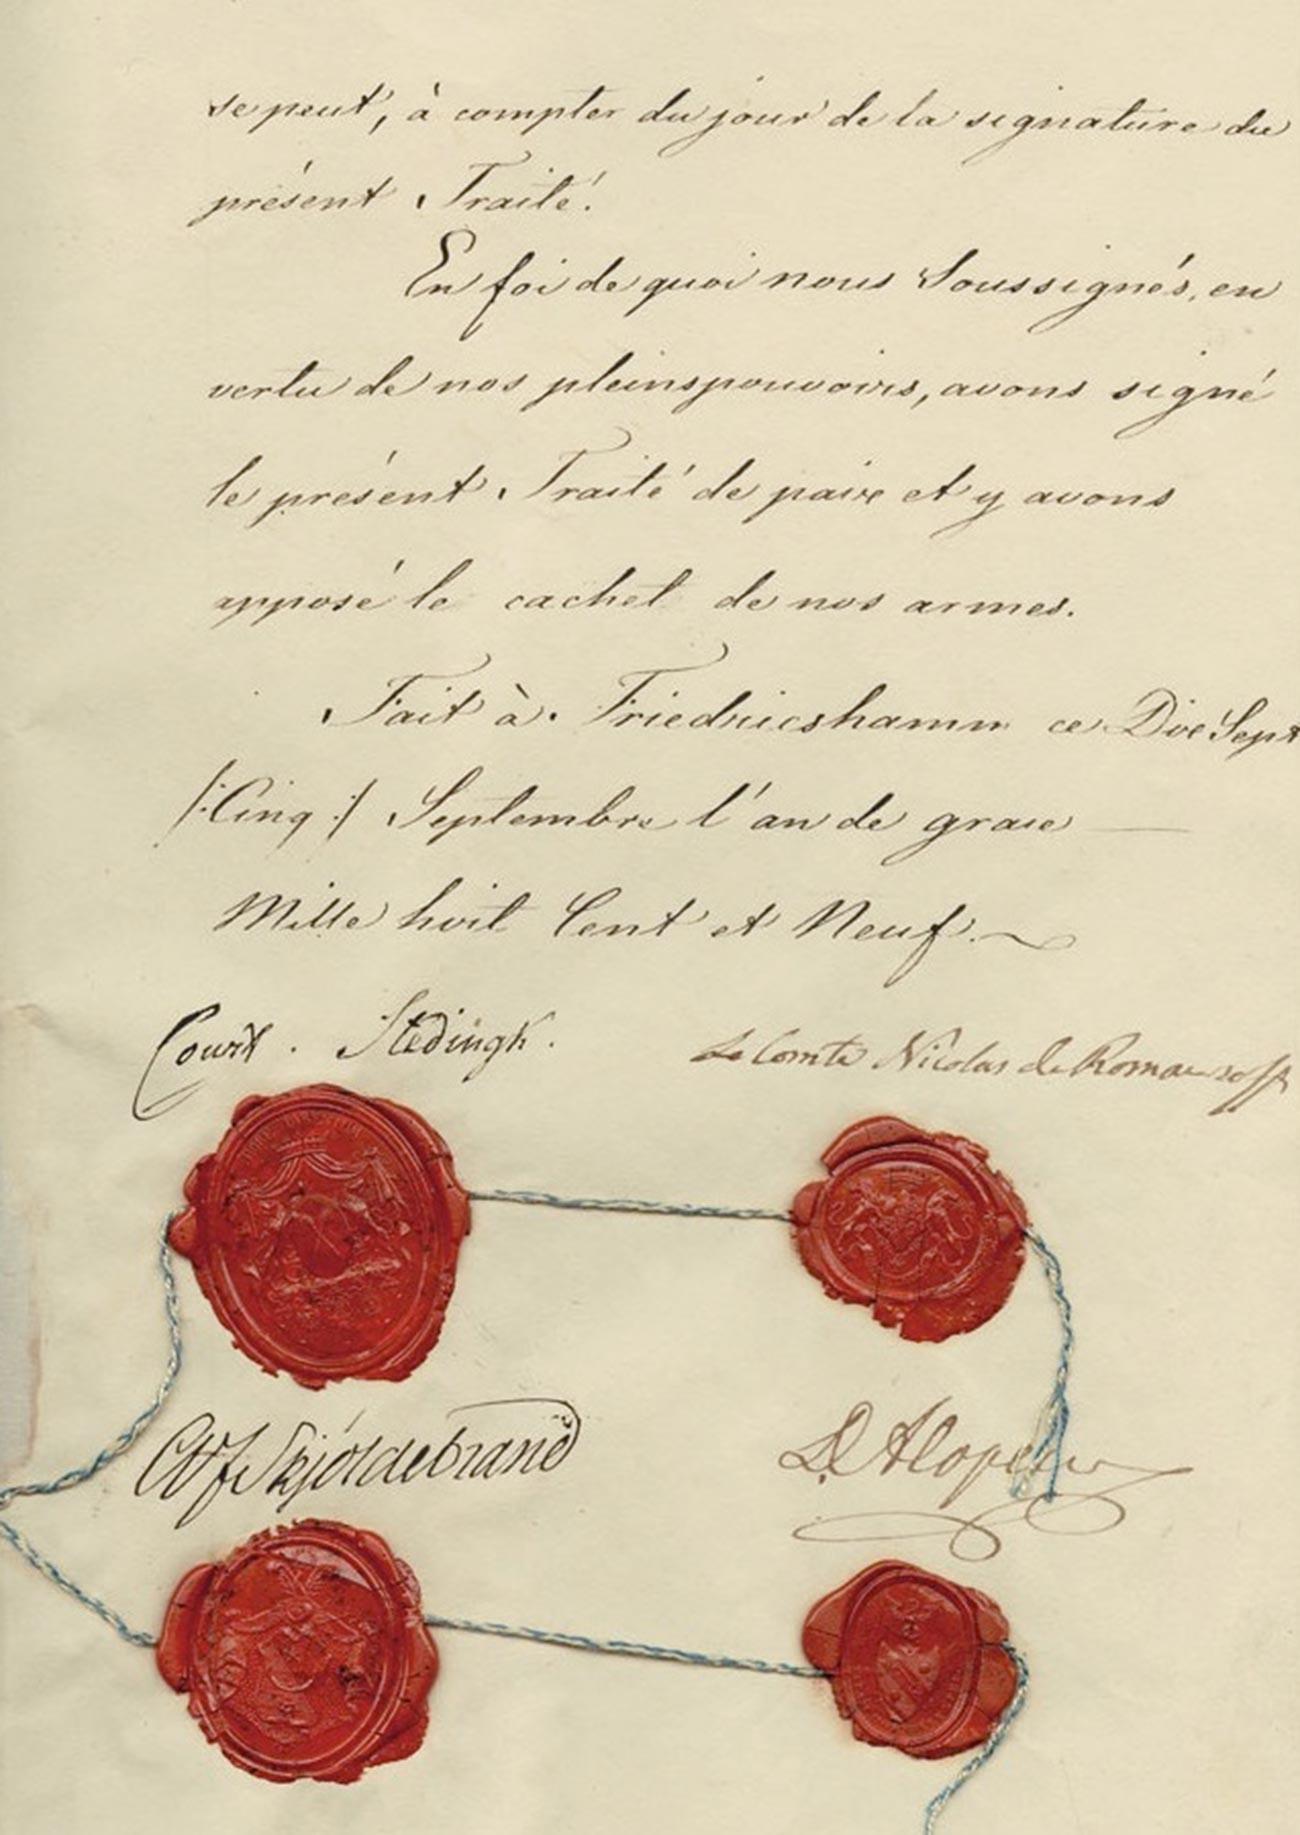 Vertrag von Fredrikshamn